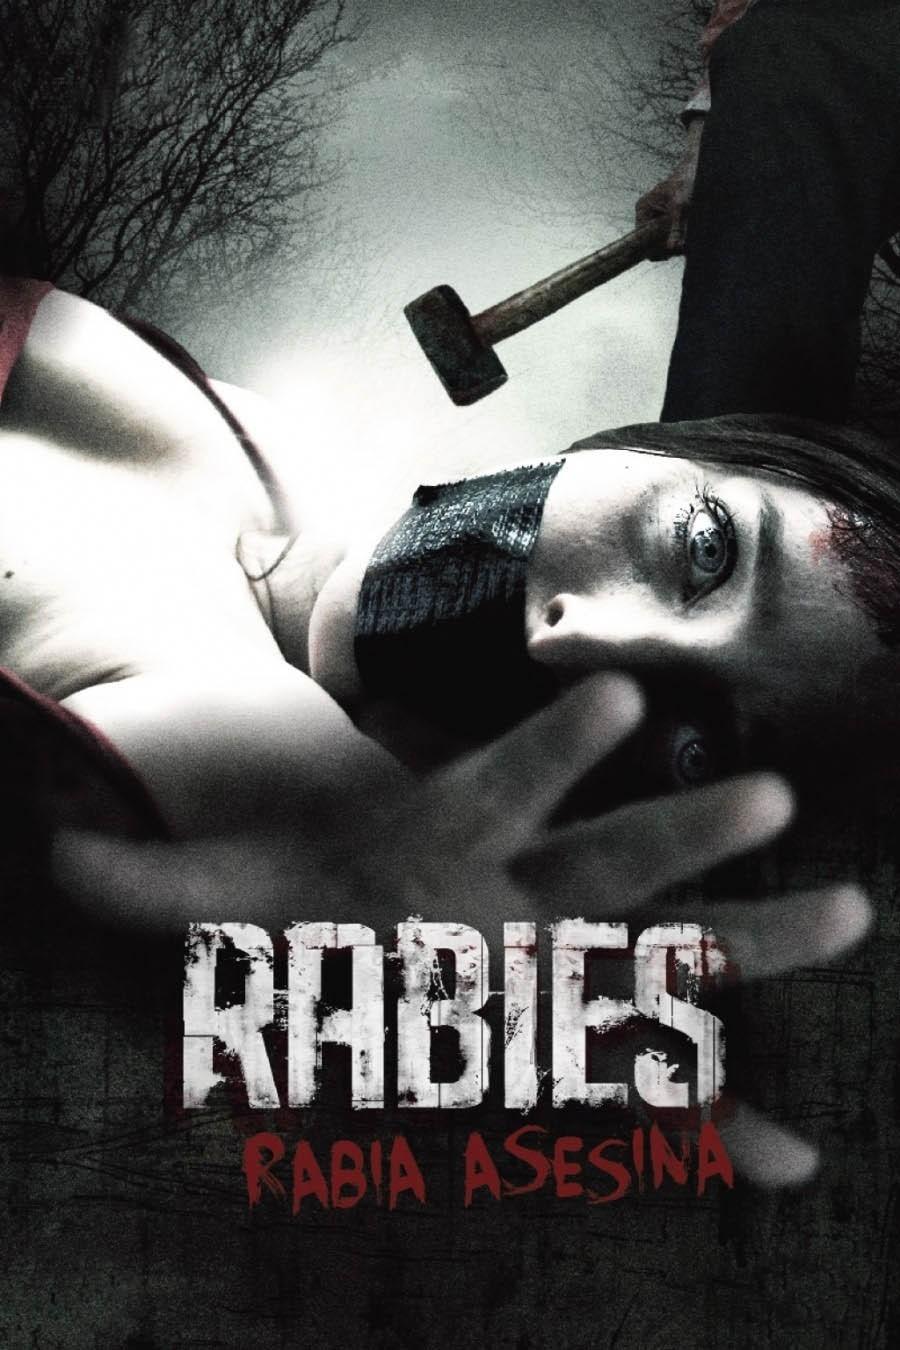 Rabies (Rabia Asesina)